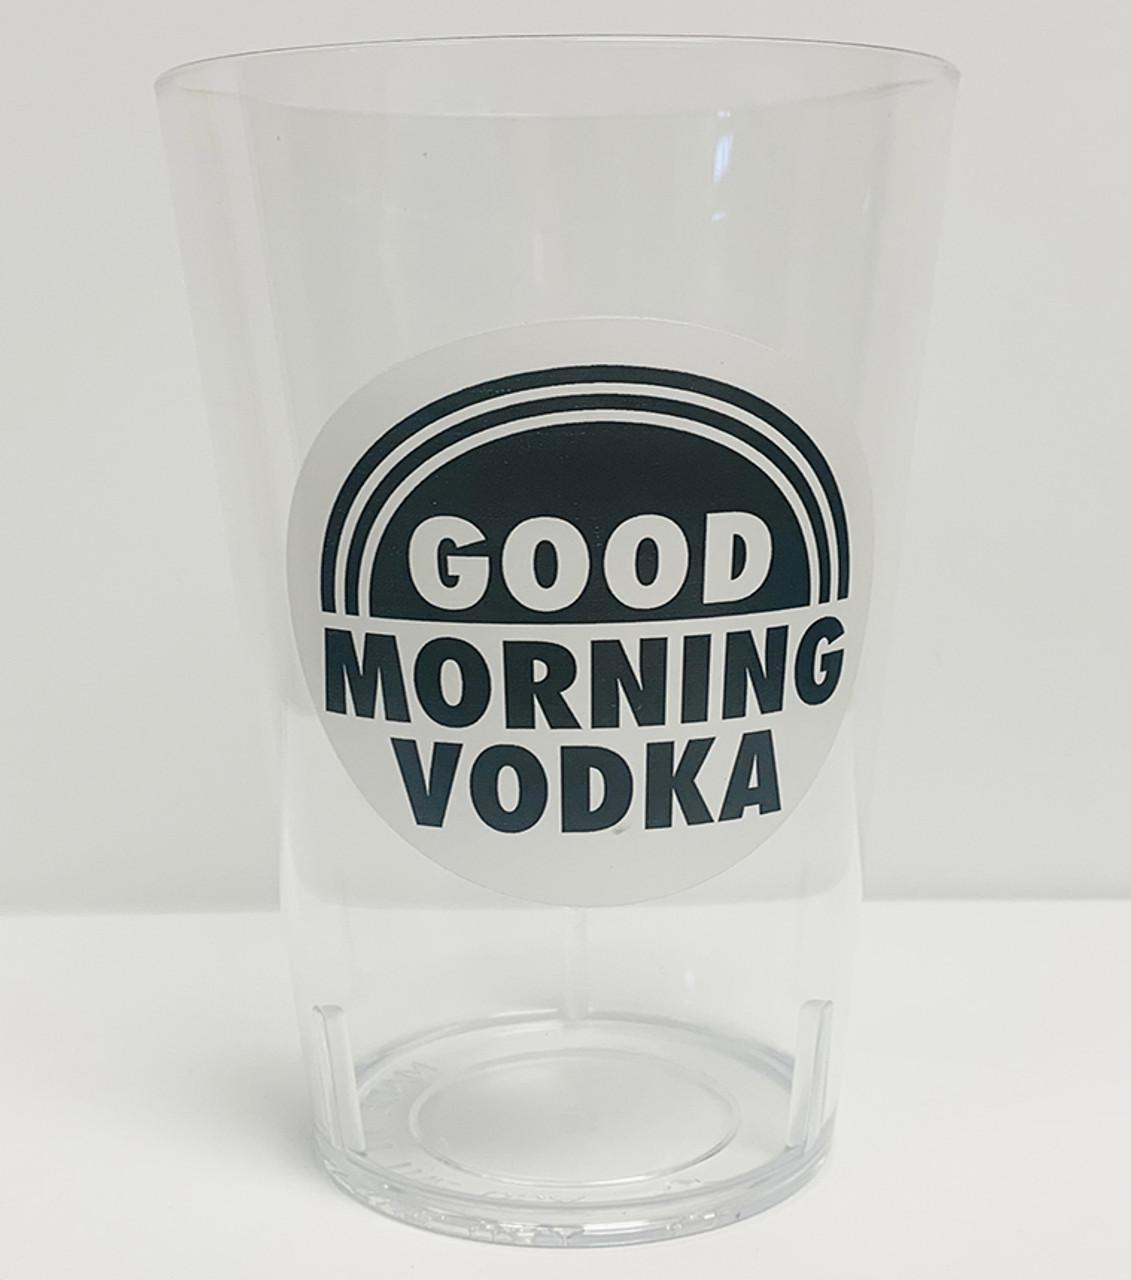 24oz Unbreakable Tritan Glass Shaker Cup w/ Good Morning Vodka logo